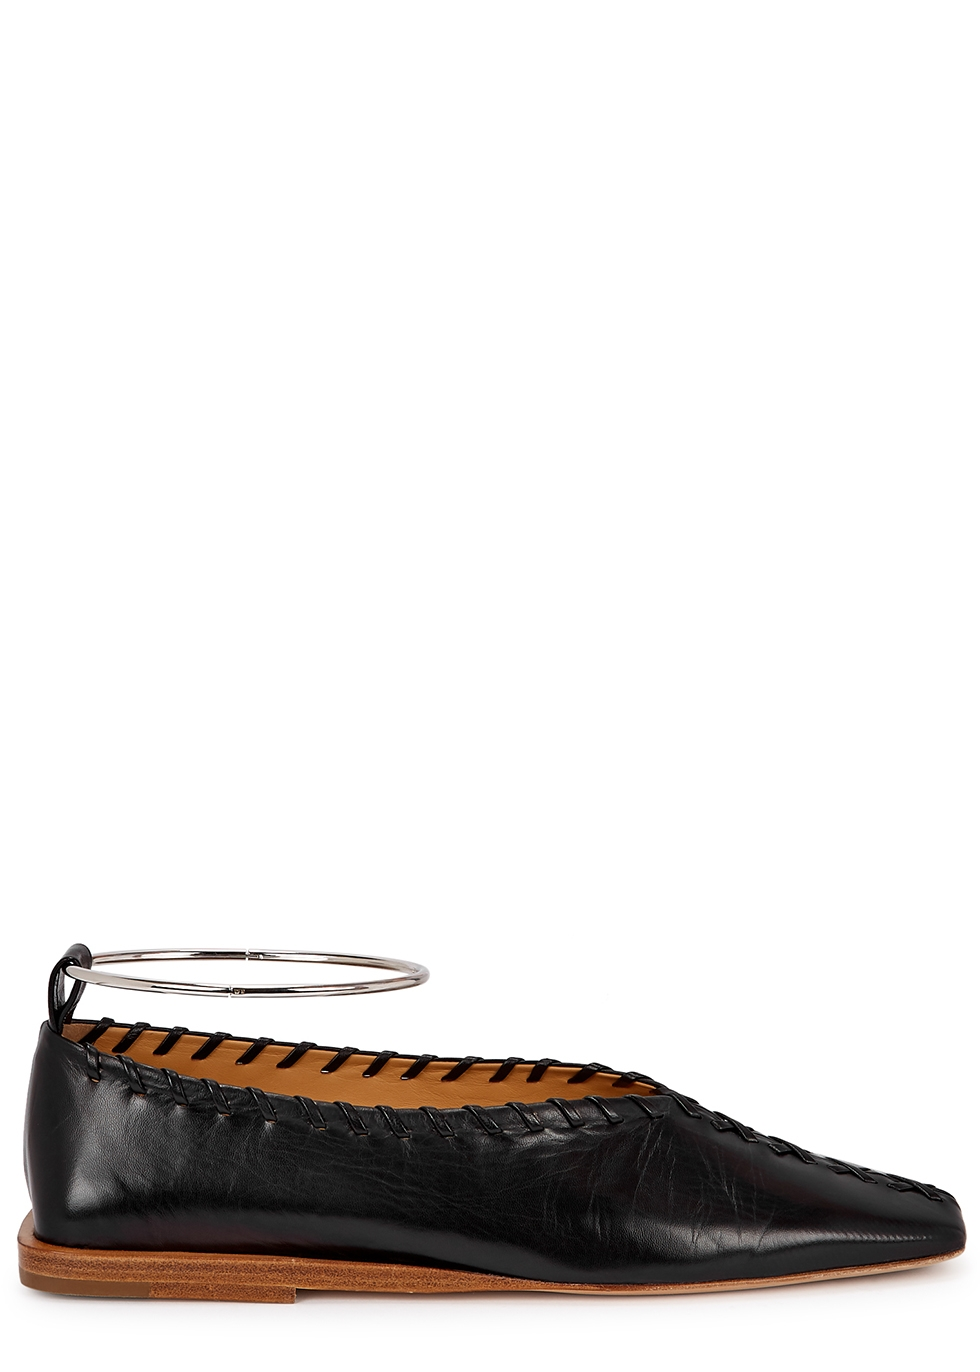 7f310e1b5e991 Women's Ballet Flats - Designer Shoes - Harvey Nichols